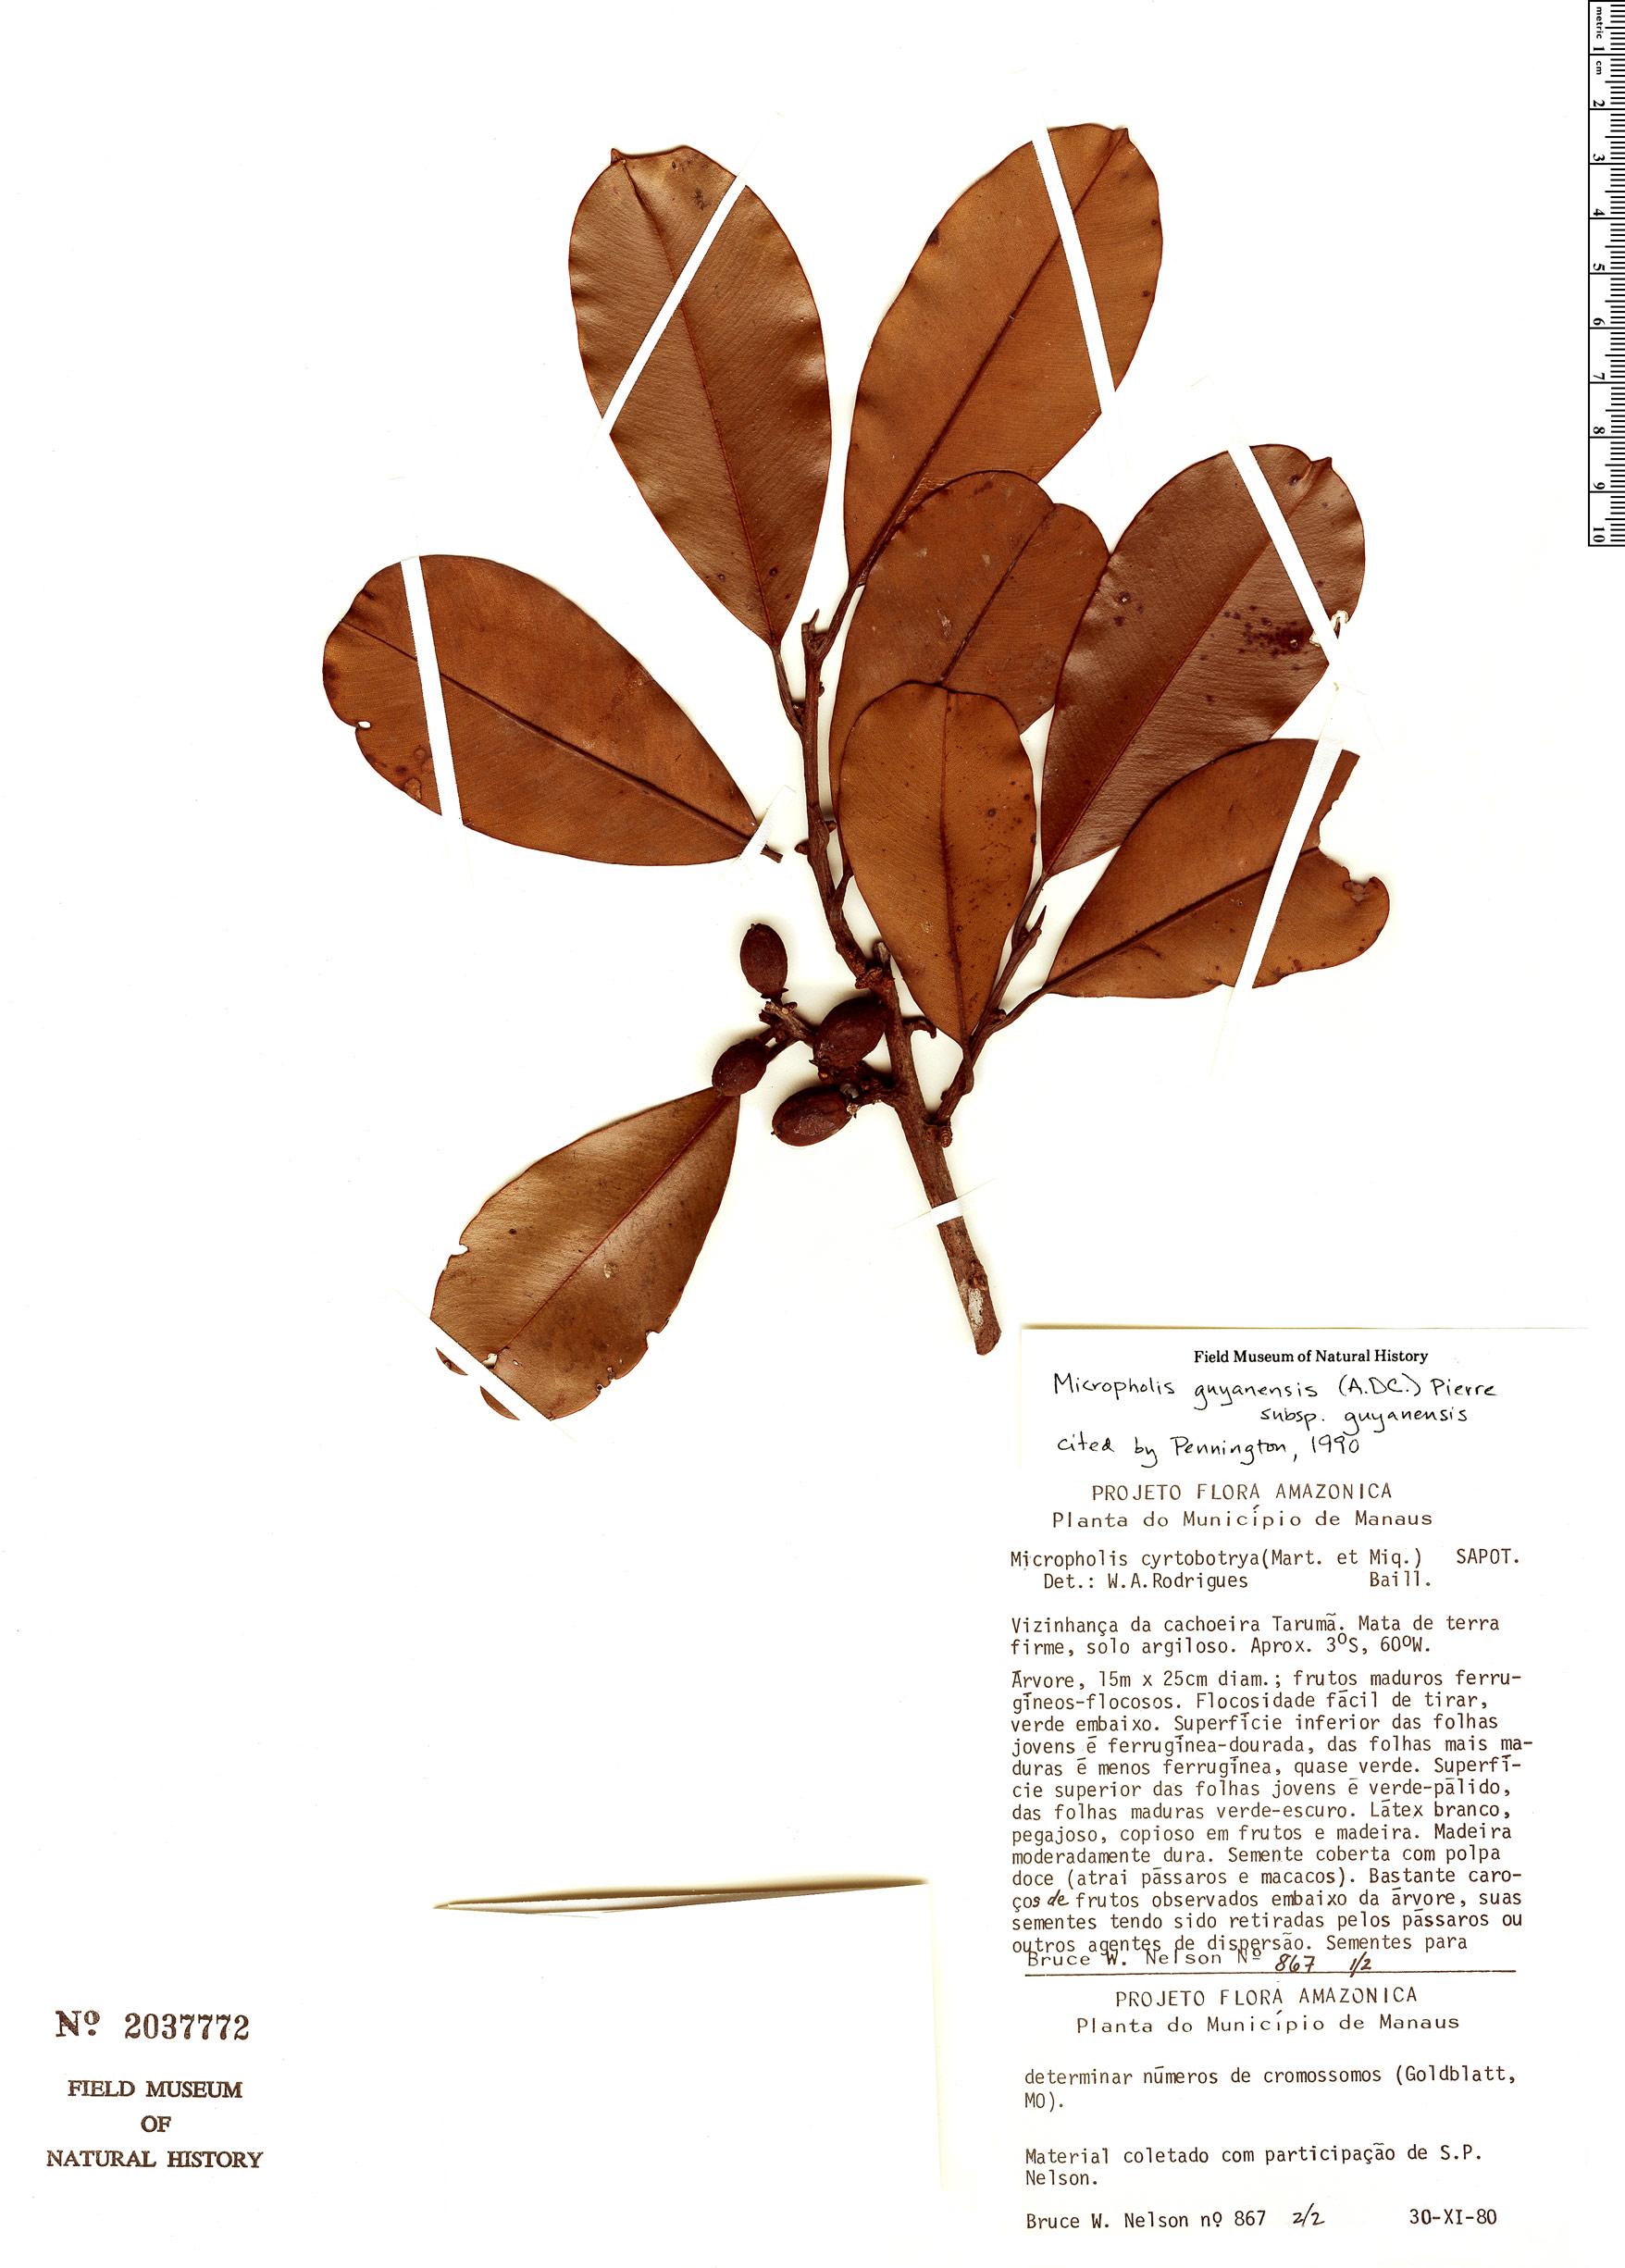 Specimen: Micropholis guyanensis